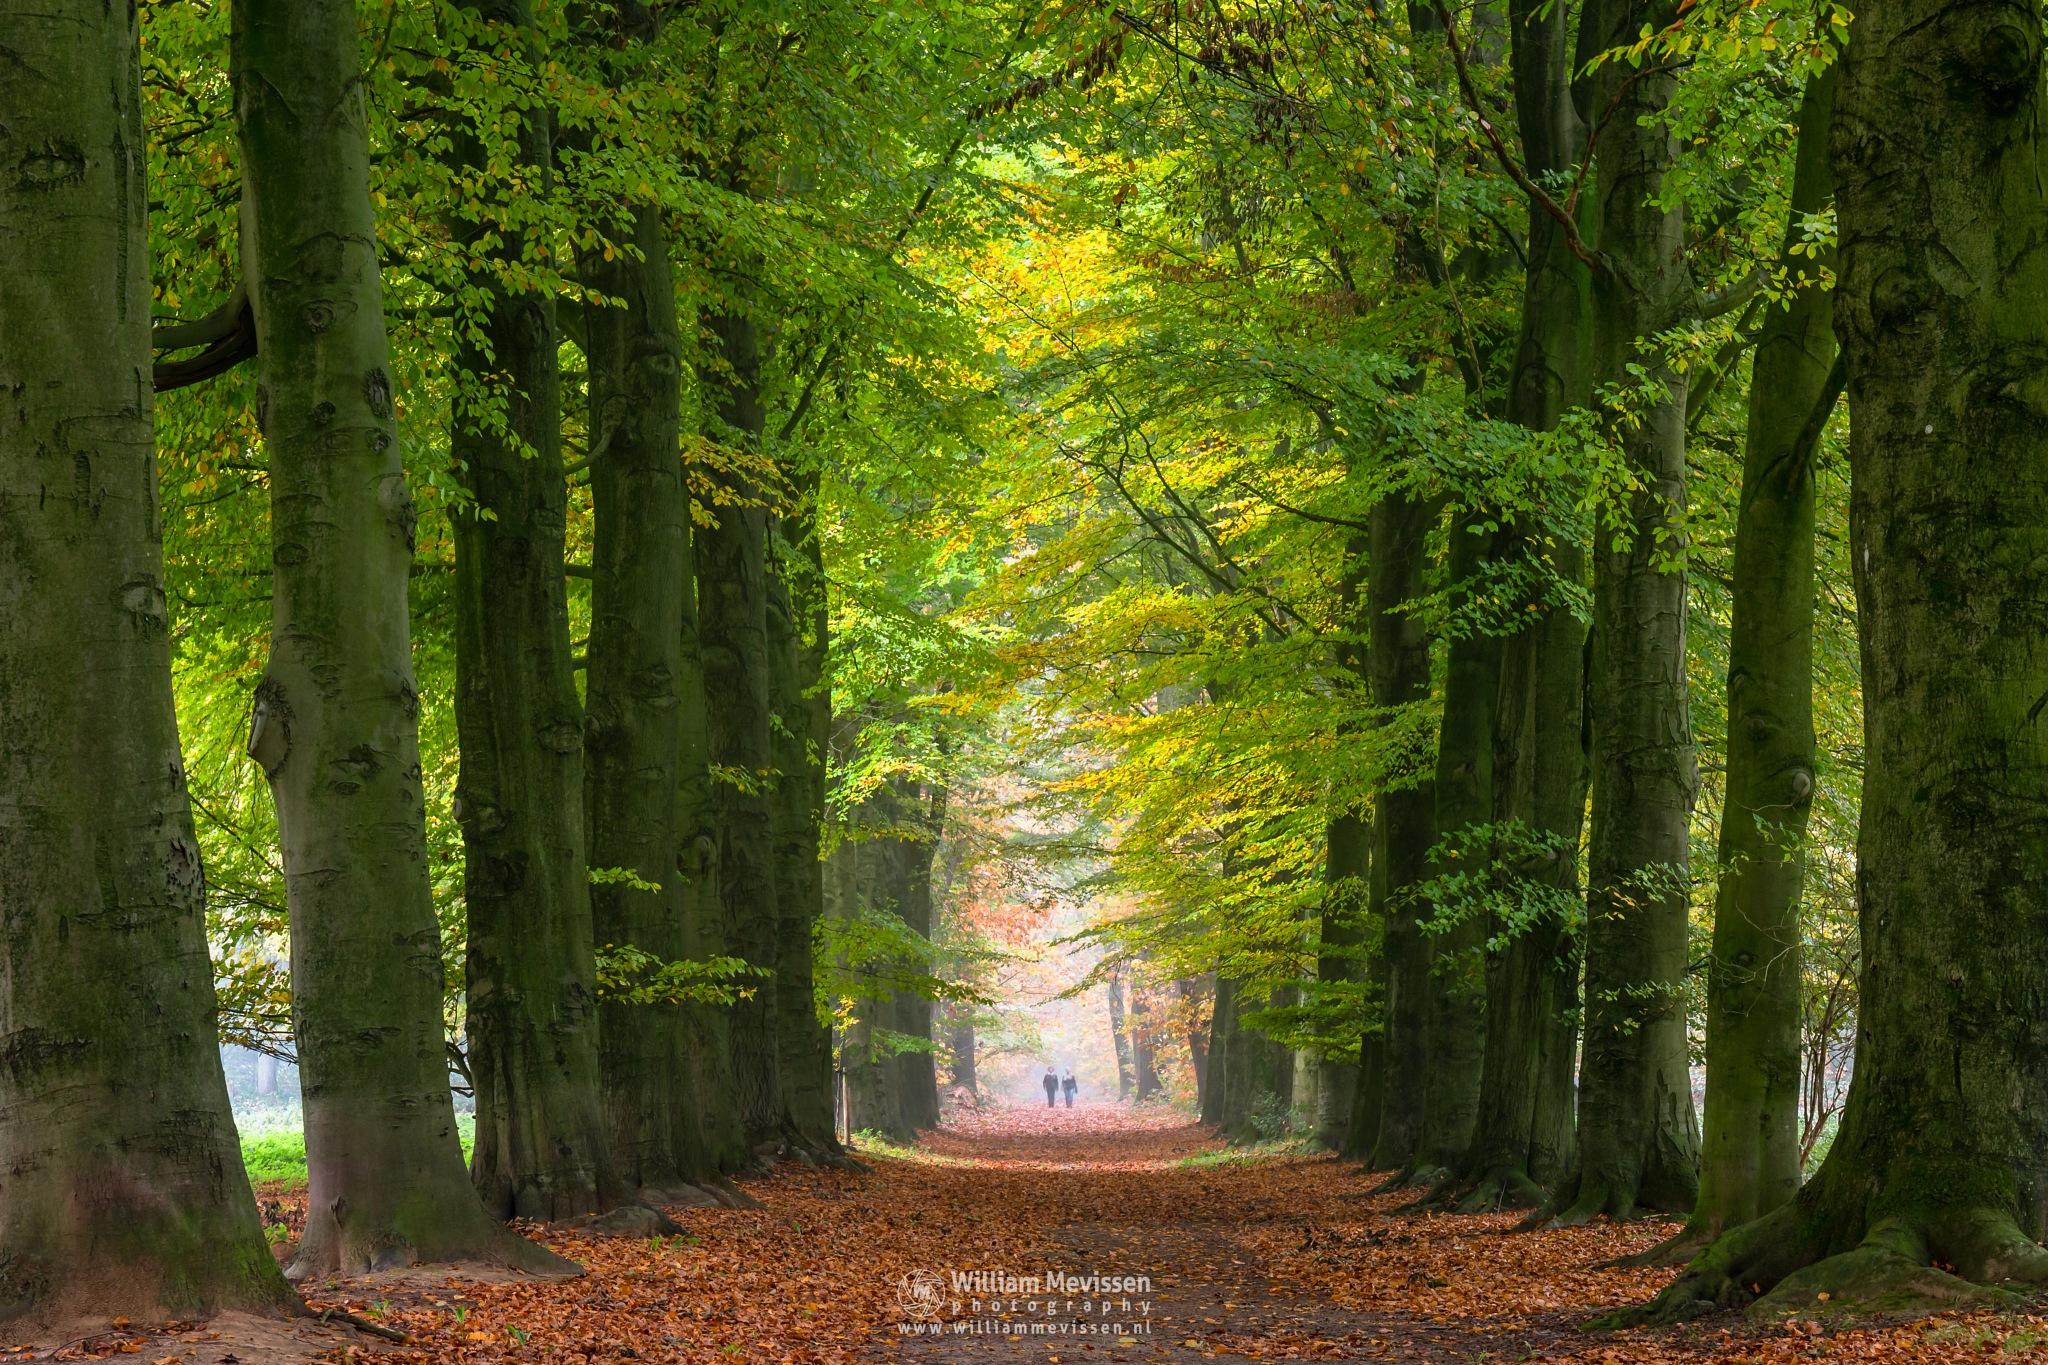 Misty Autumn Morning Walking by William Mevissen